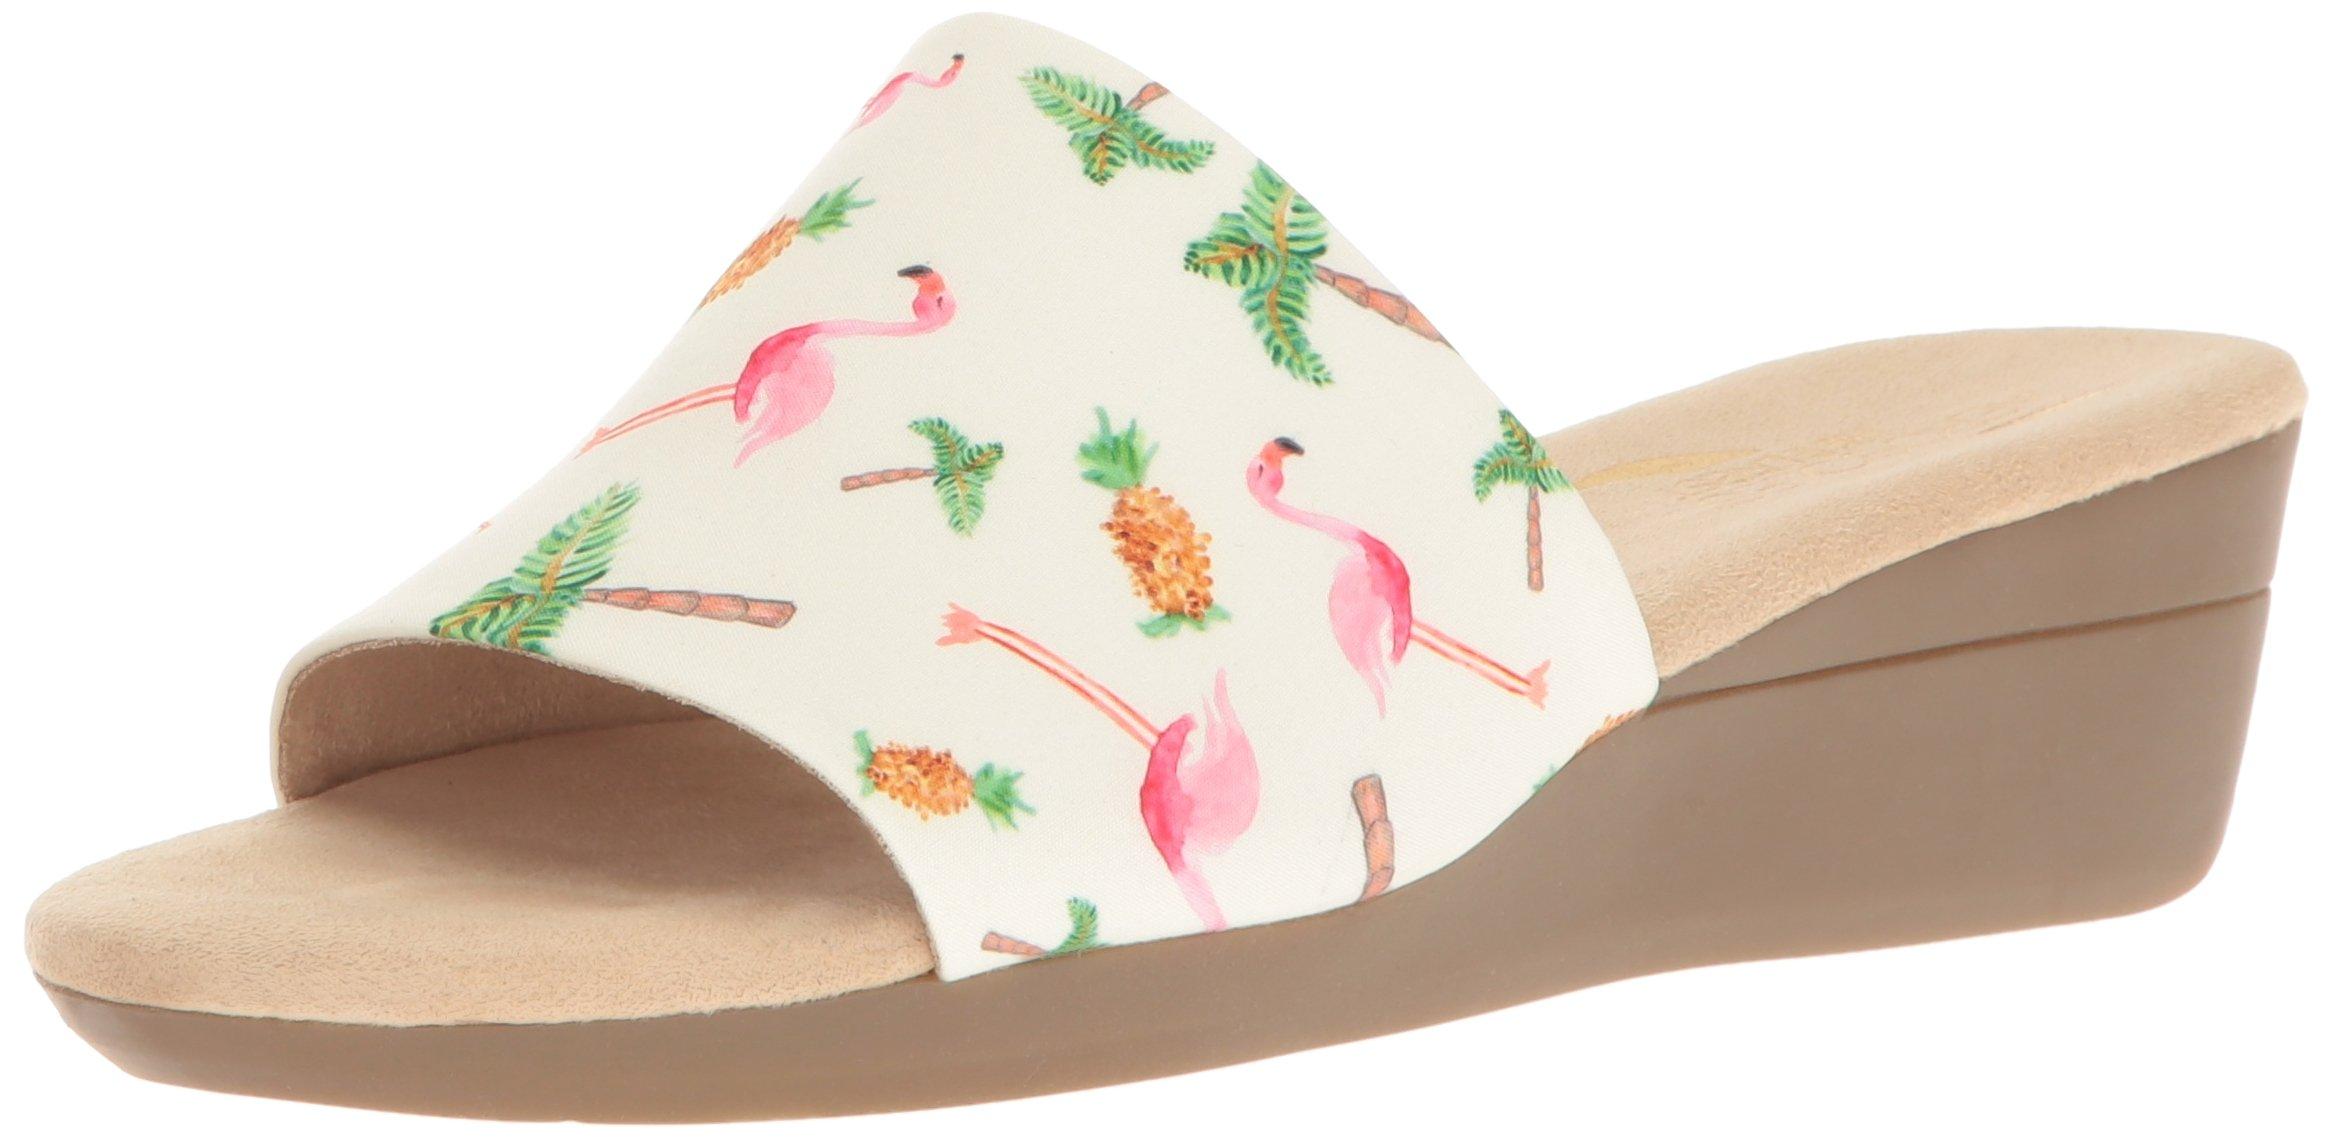 Aerosoles Women's Florida Wedge Sandal, Bone Combo, 11 M US